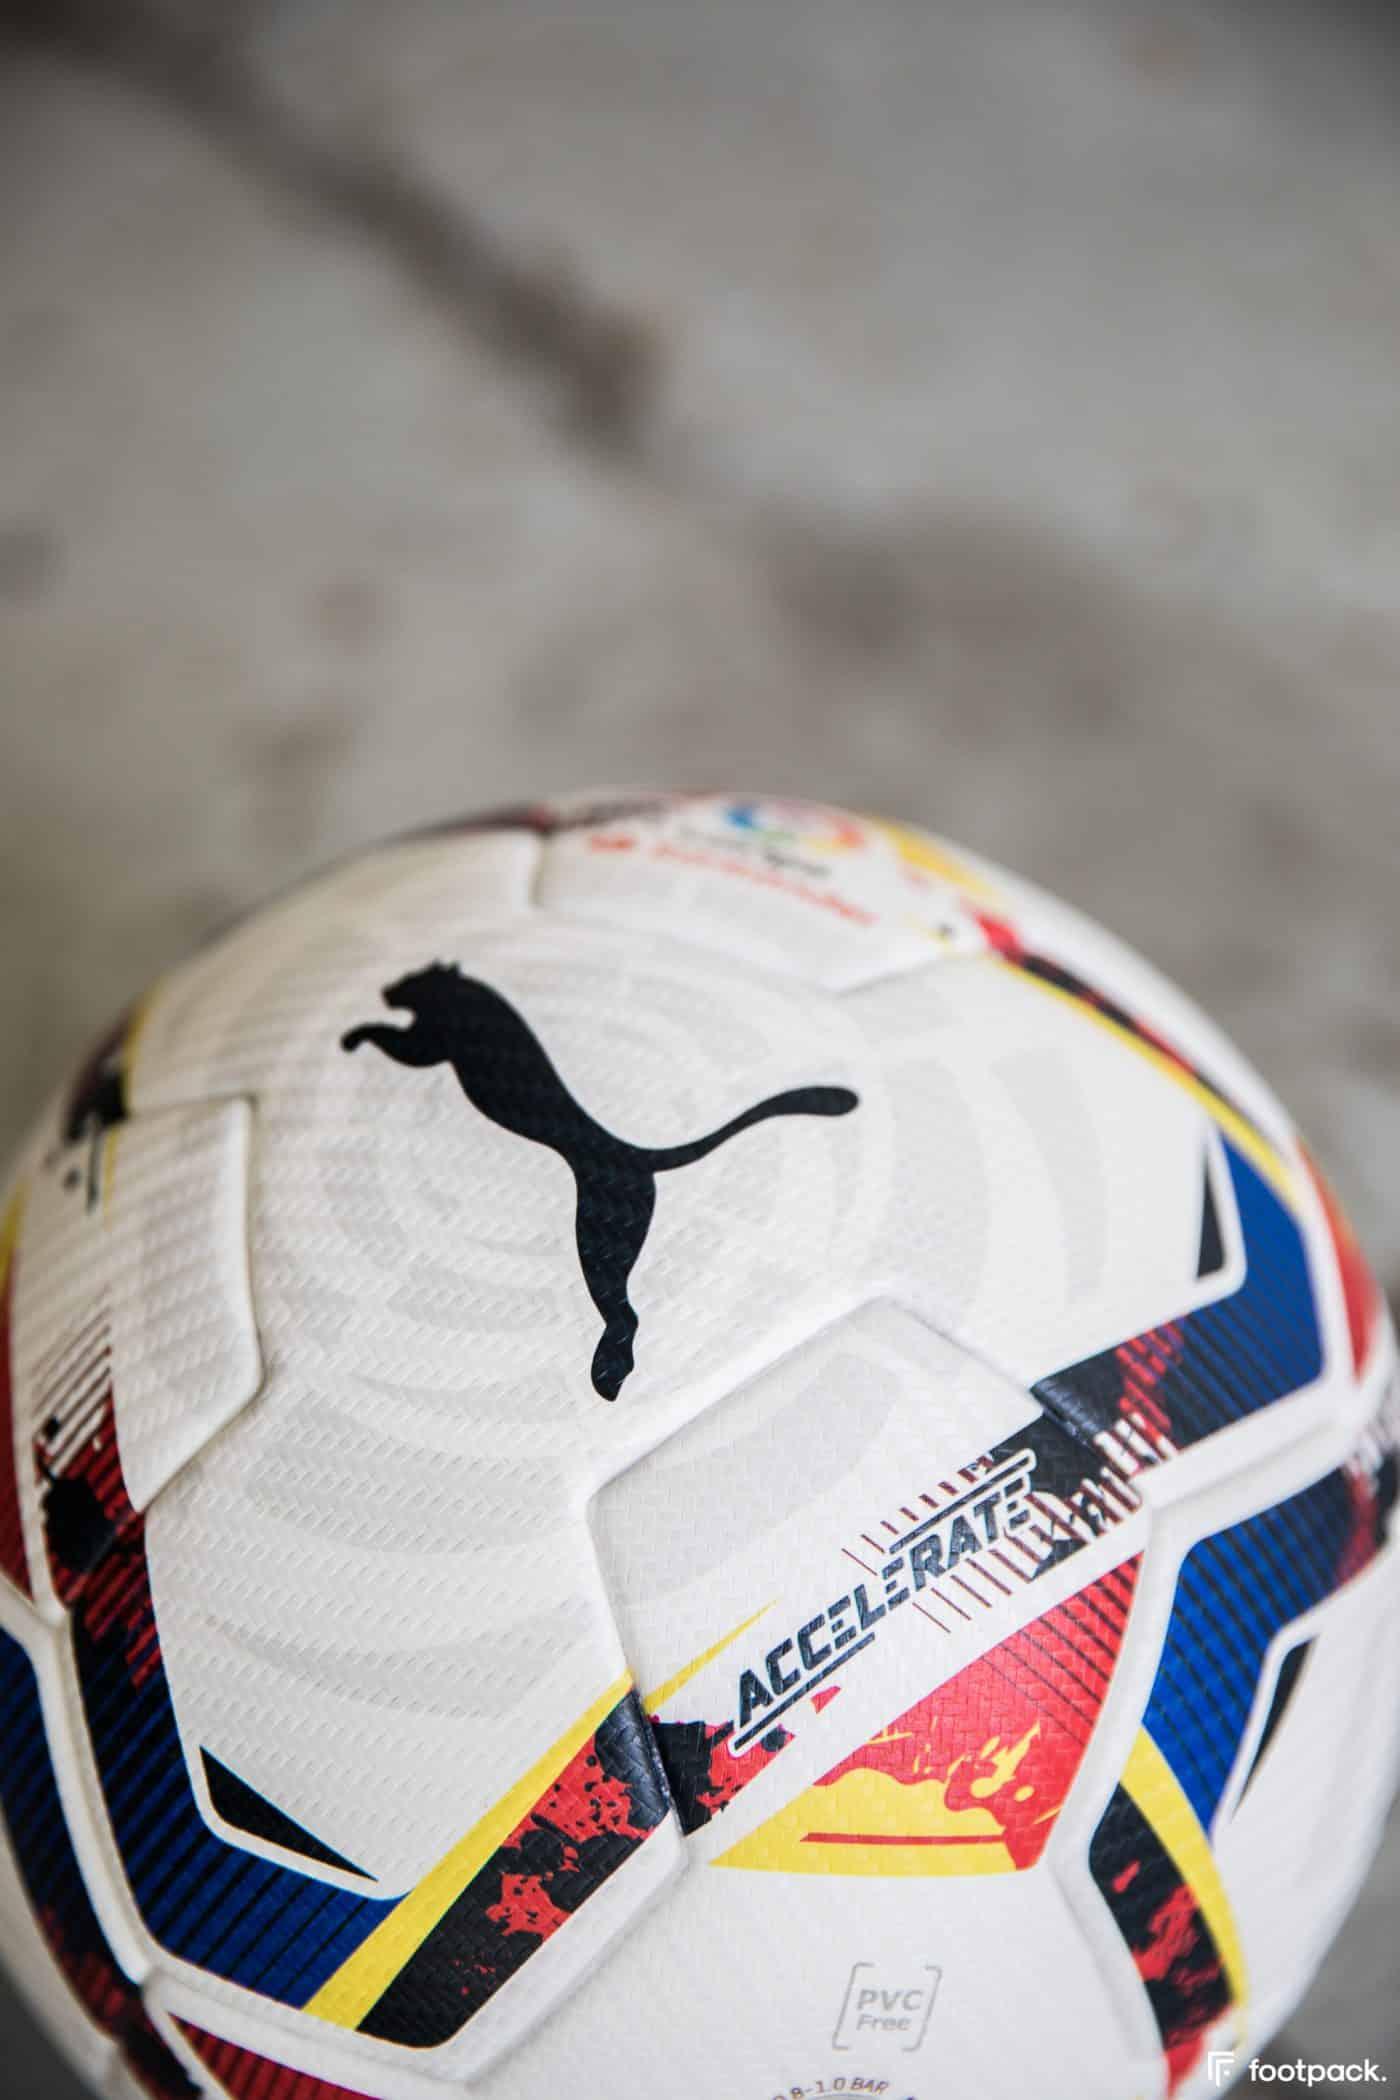 ballon-championnat-espagne-la-liga-2020-2021-puma-footpack-12